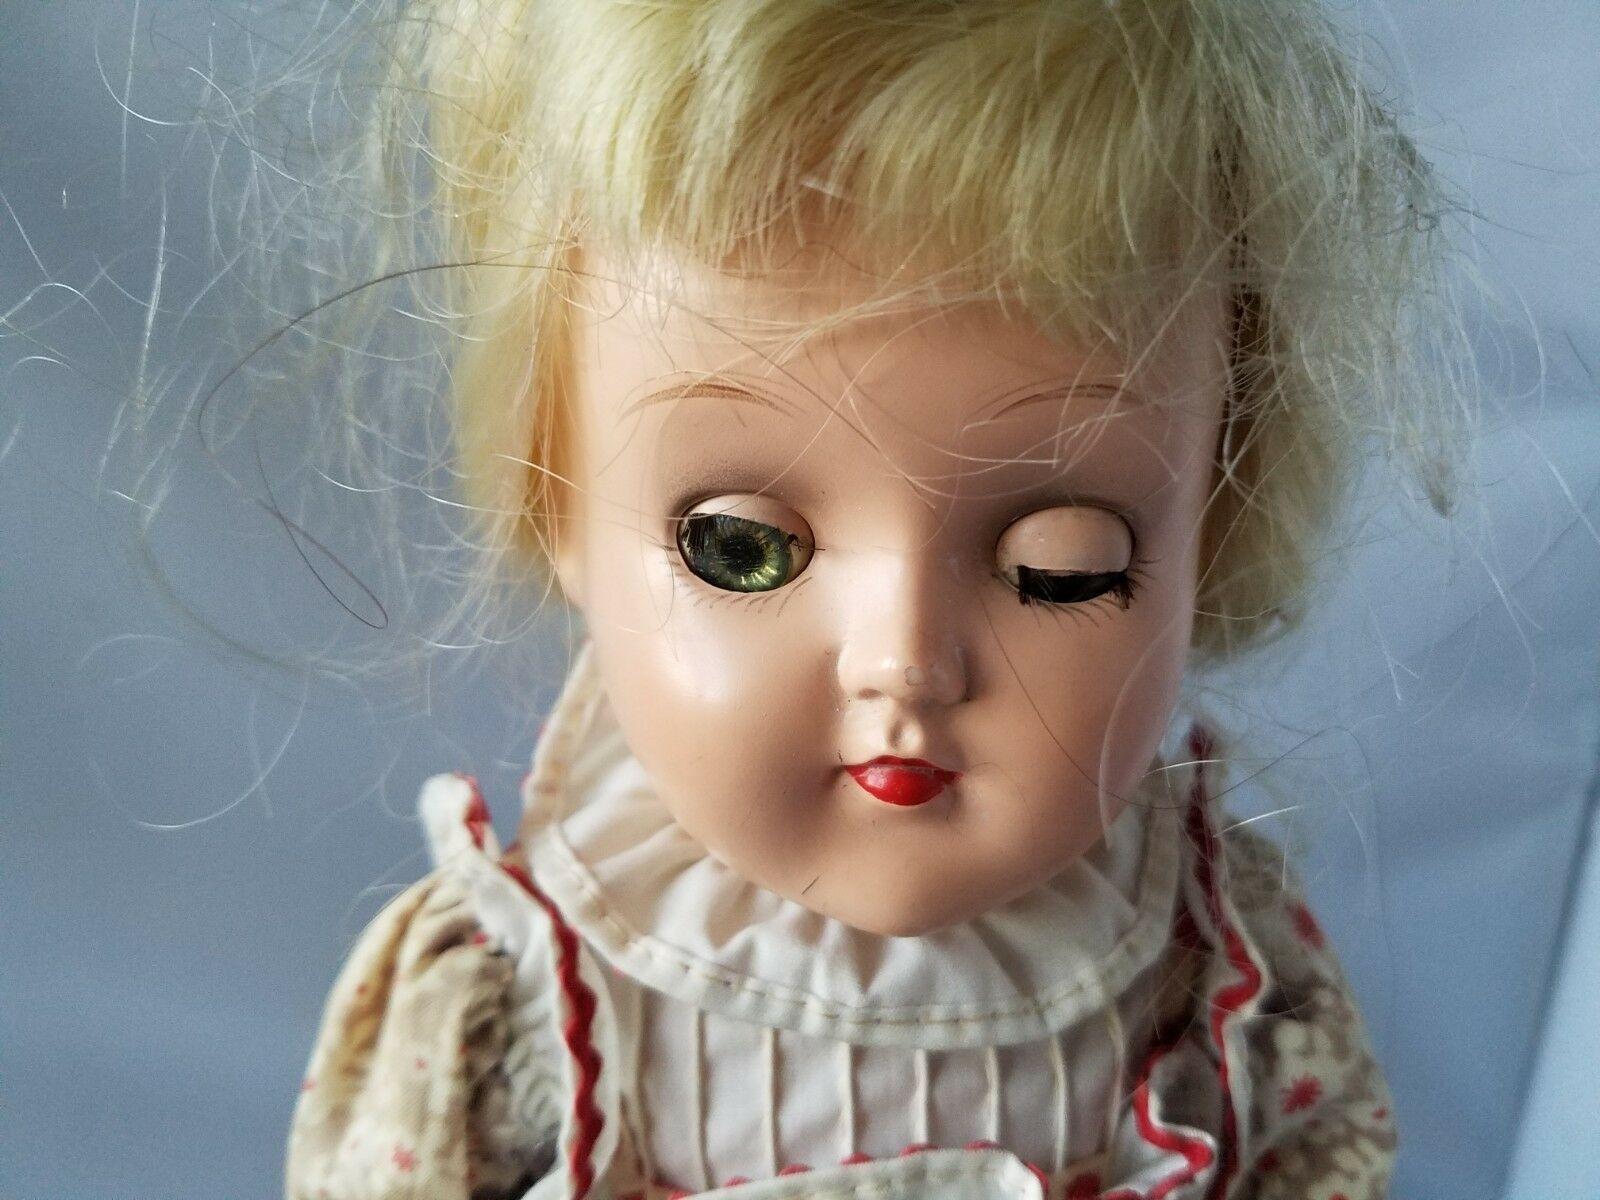 Ideal Doll Vintage Blonde Hair Green Eyes Hard Plastic Doll Toy Dress